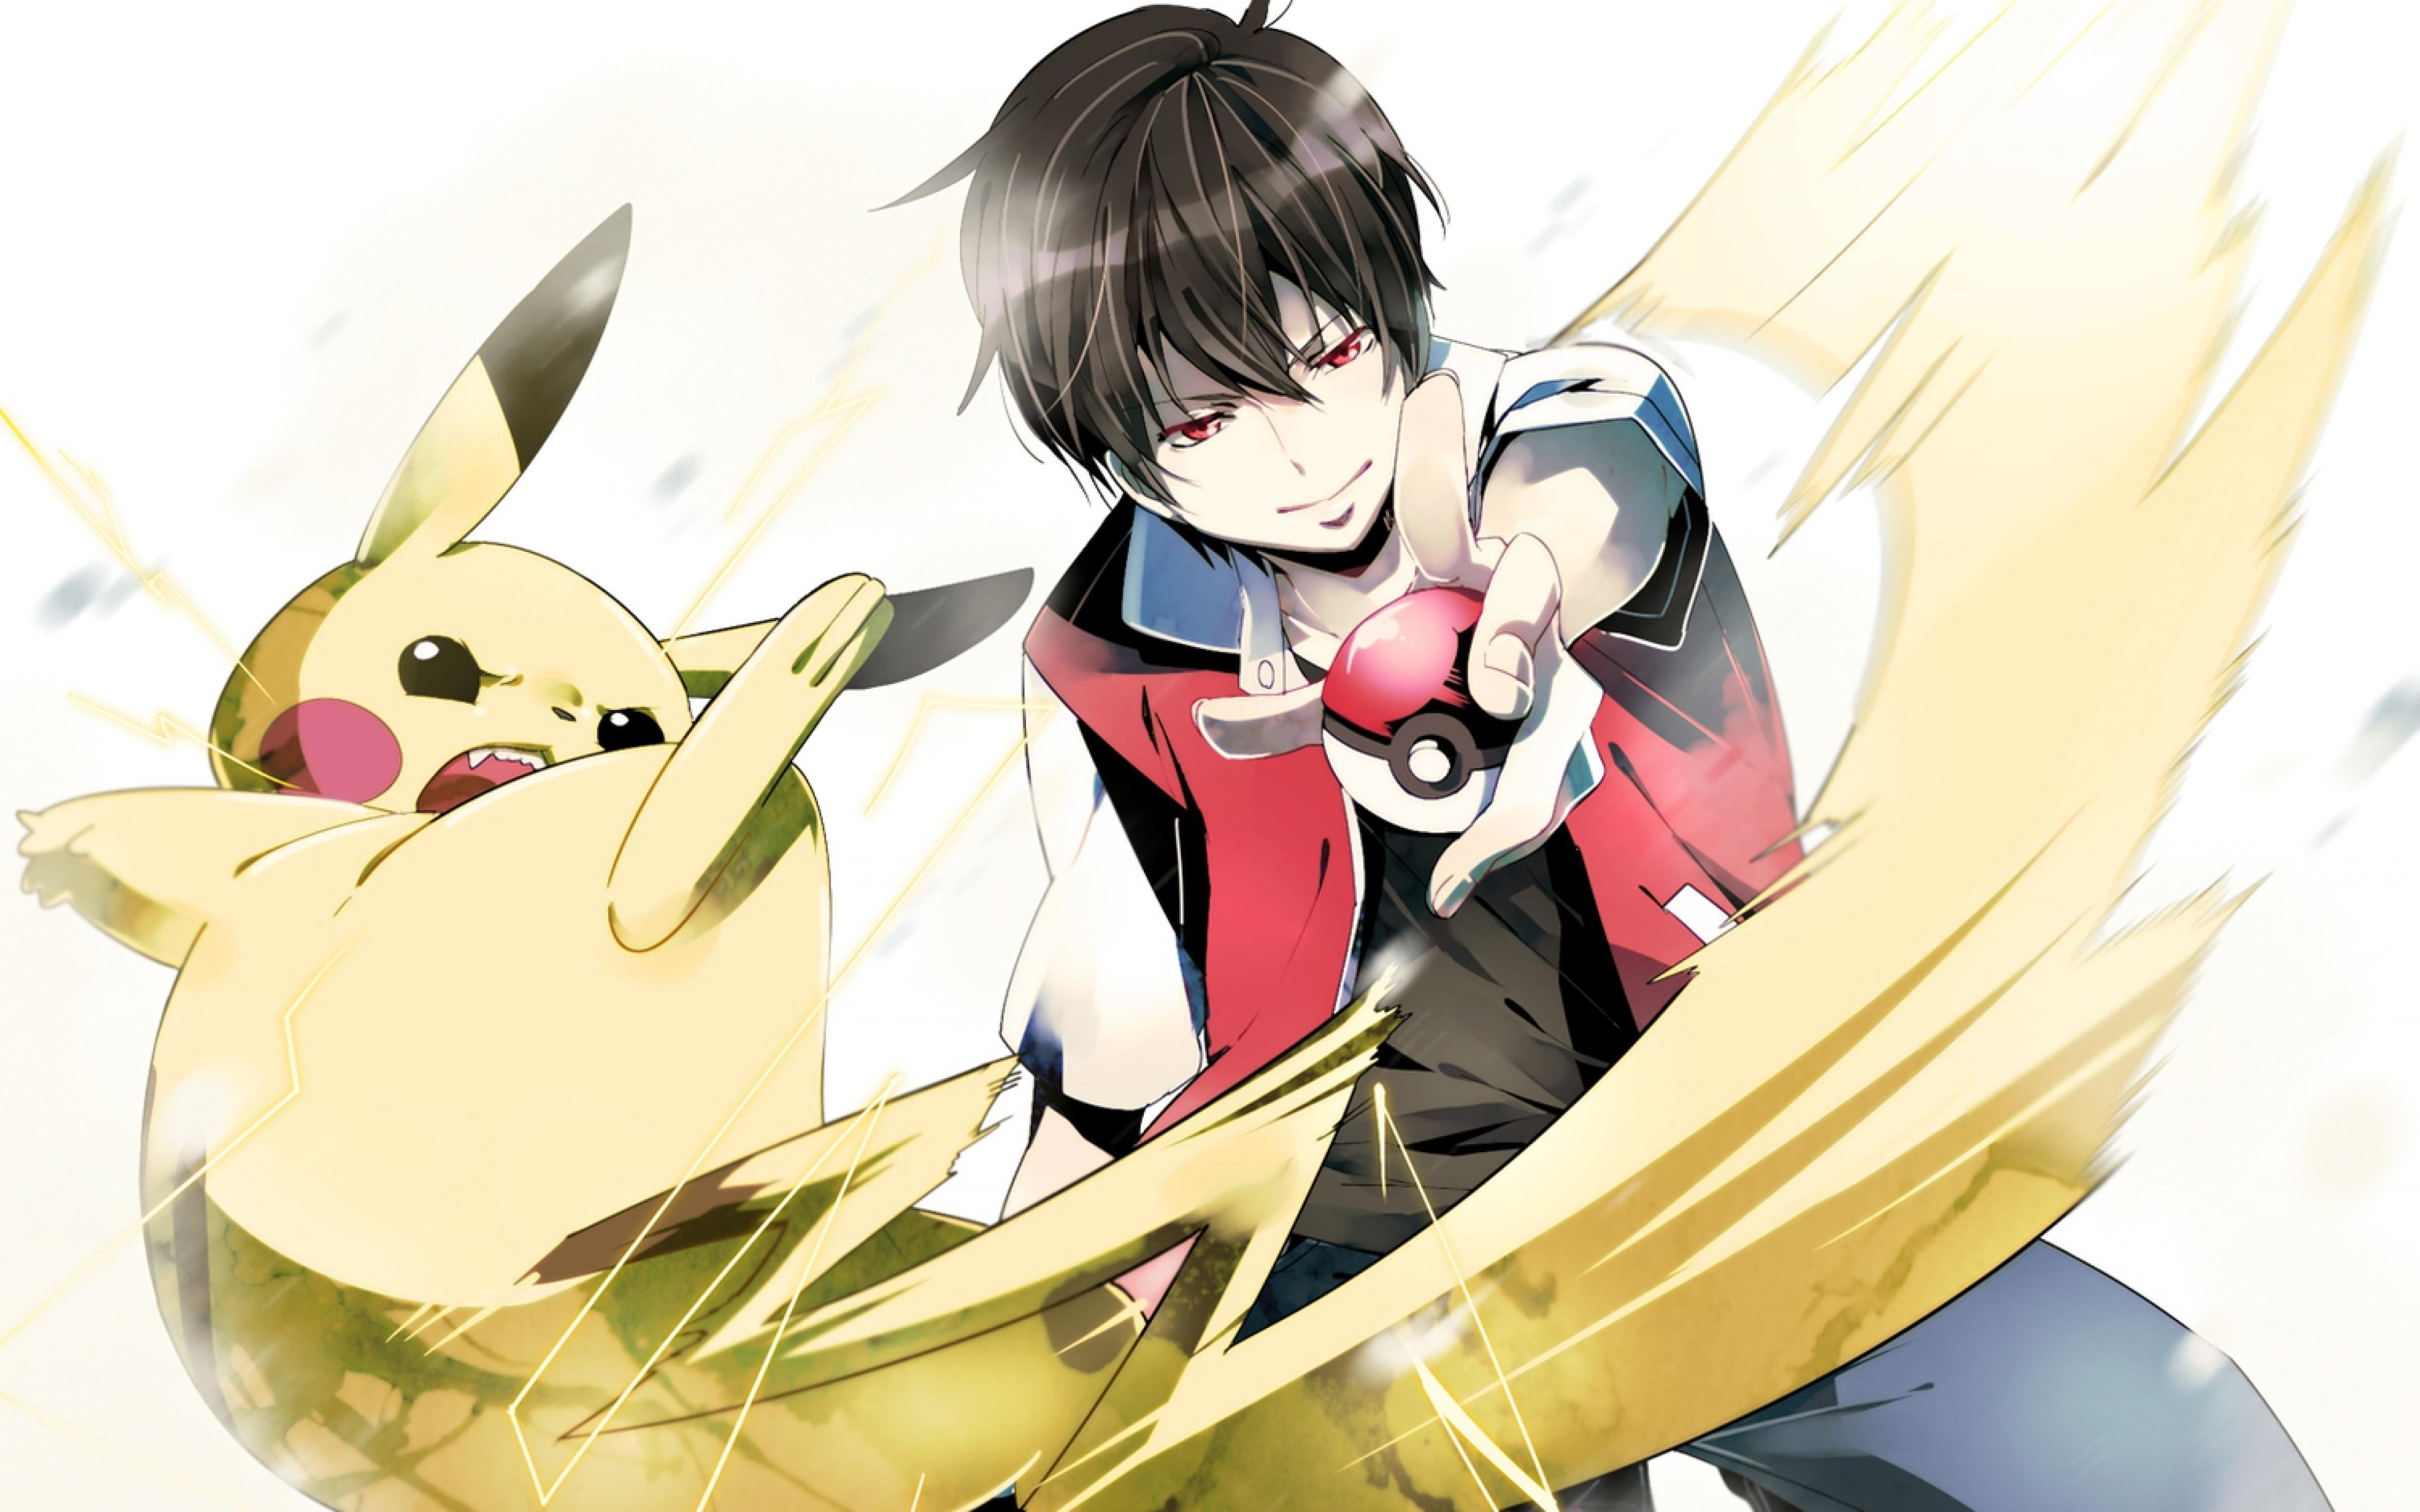 fond d'ecran anime 3840x2400